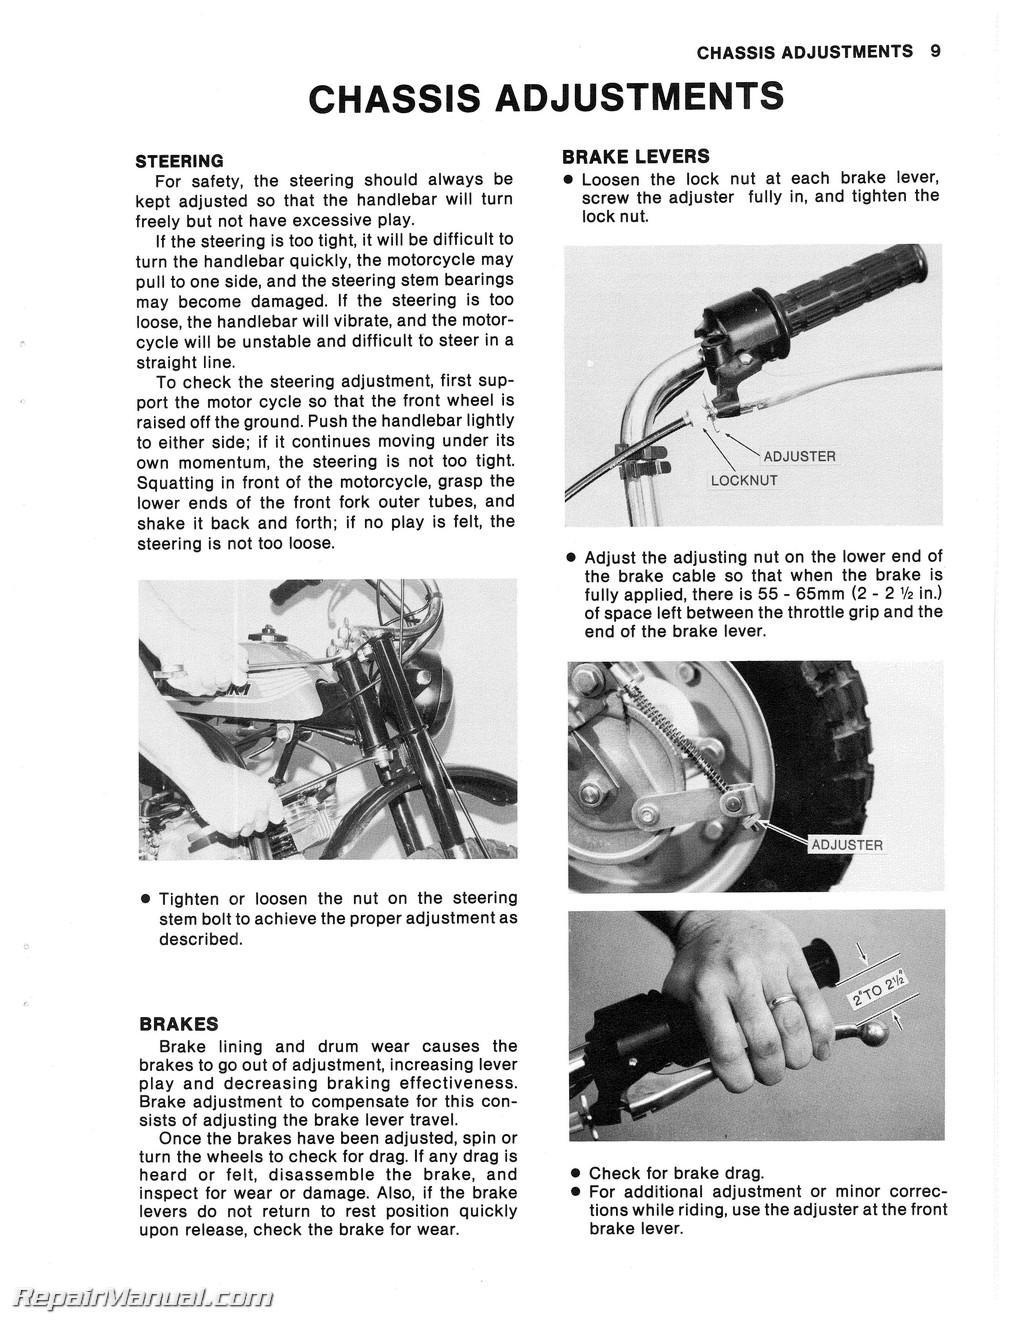 1971 1980 kawasaki mt1 kv75 motorcycle service manual 800 426 4214 ebay. Black Bedroom Furniture Sets. Home Design Ideas